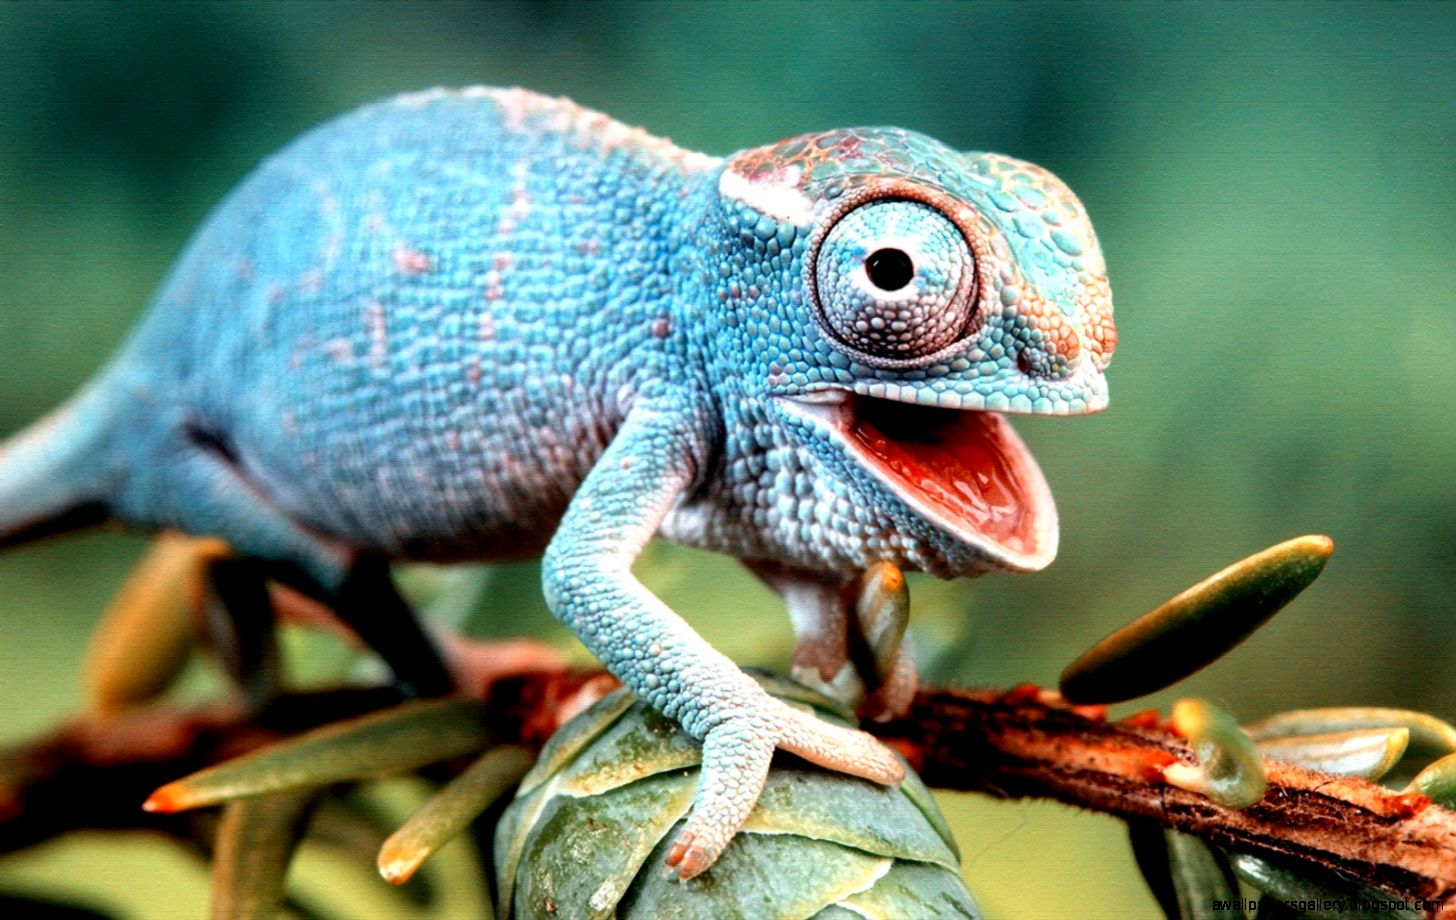 Colorful Lizard Wallpaper | Wallpapers Gallery